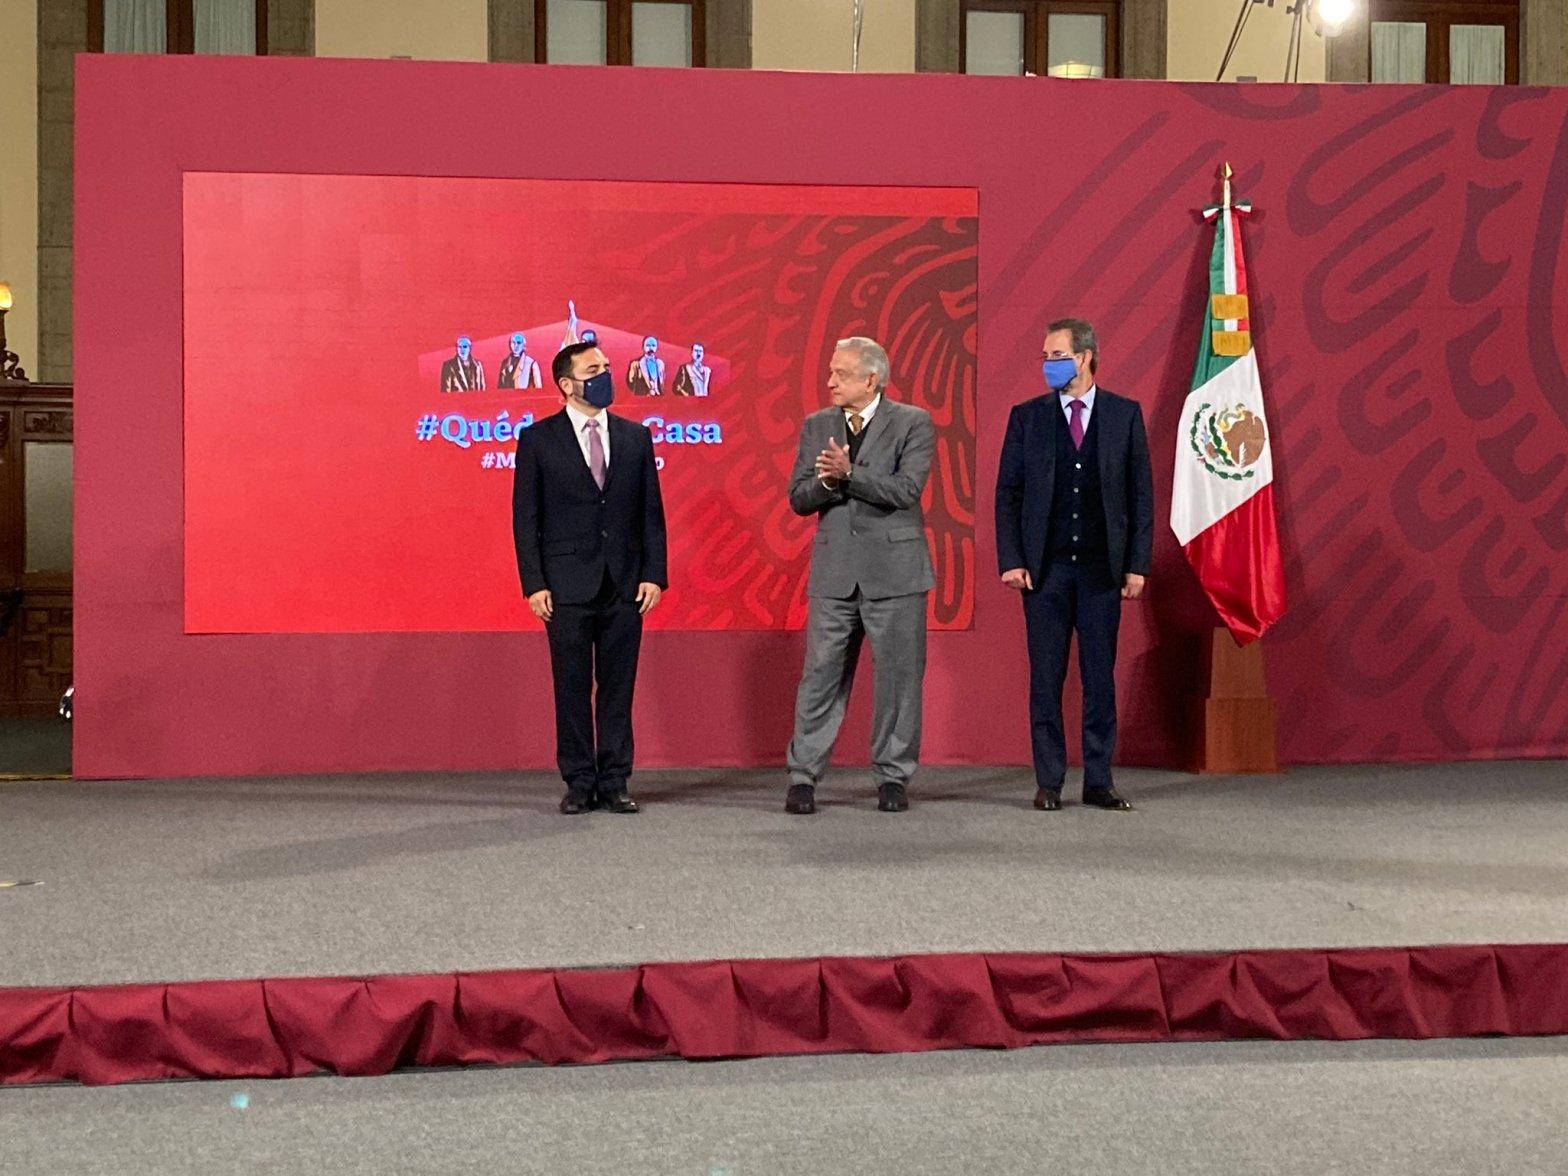 Arturo Reyes Sandoval, Andrés Manuel López Obrador y Esteban Moctezuma